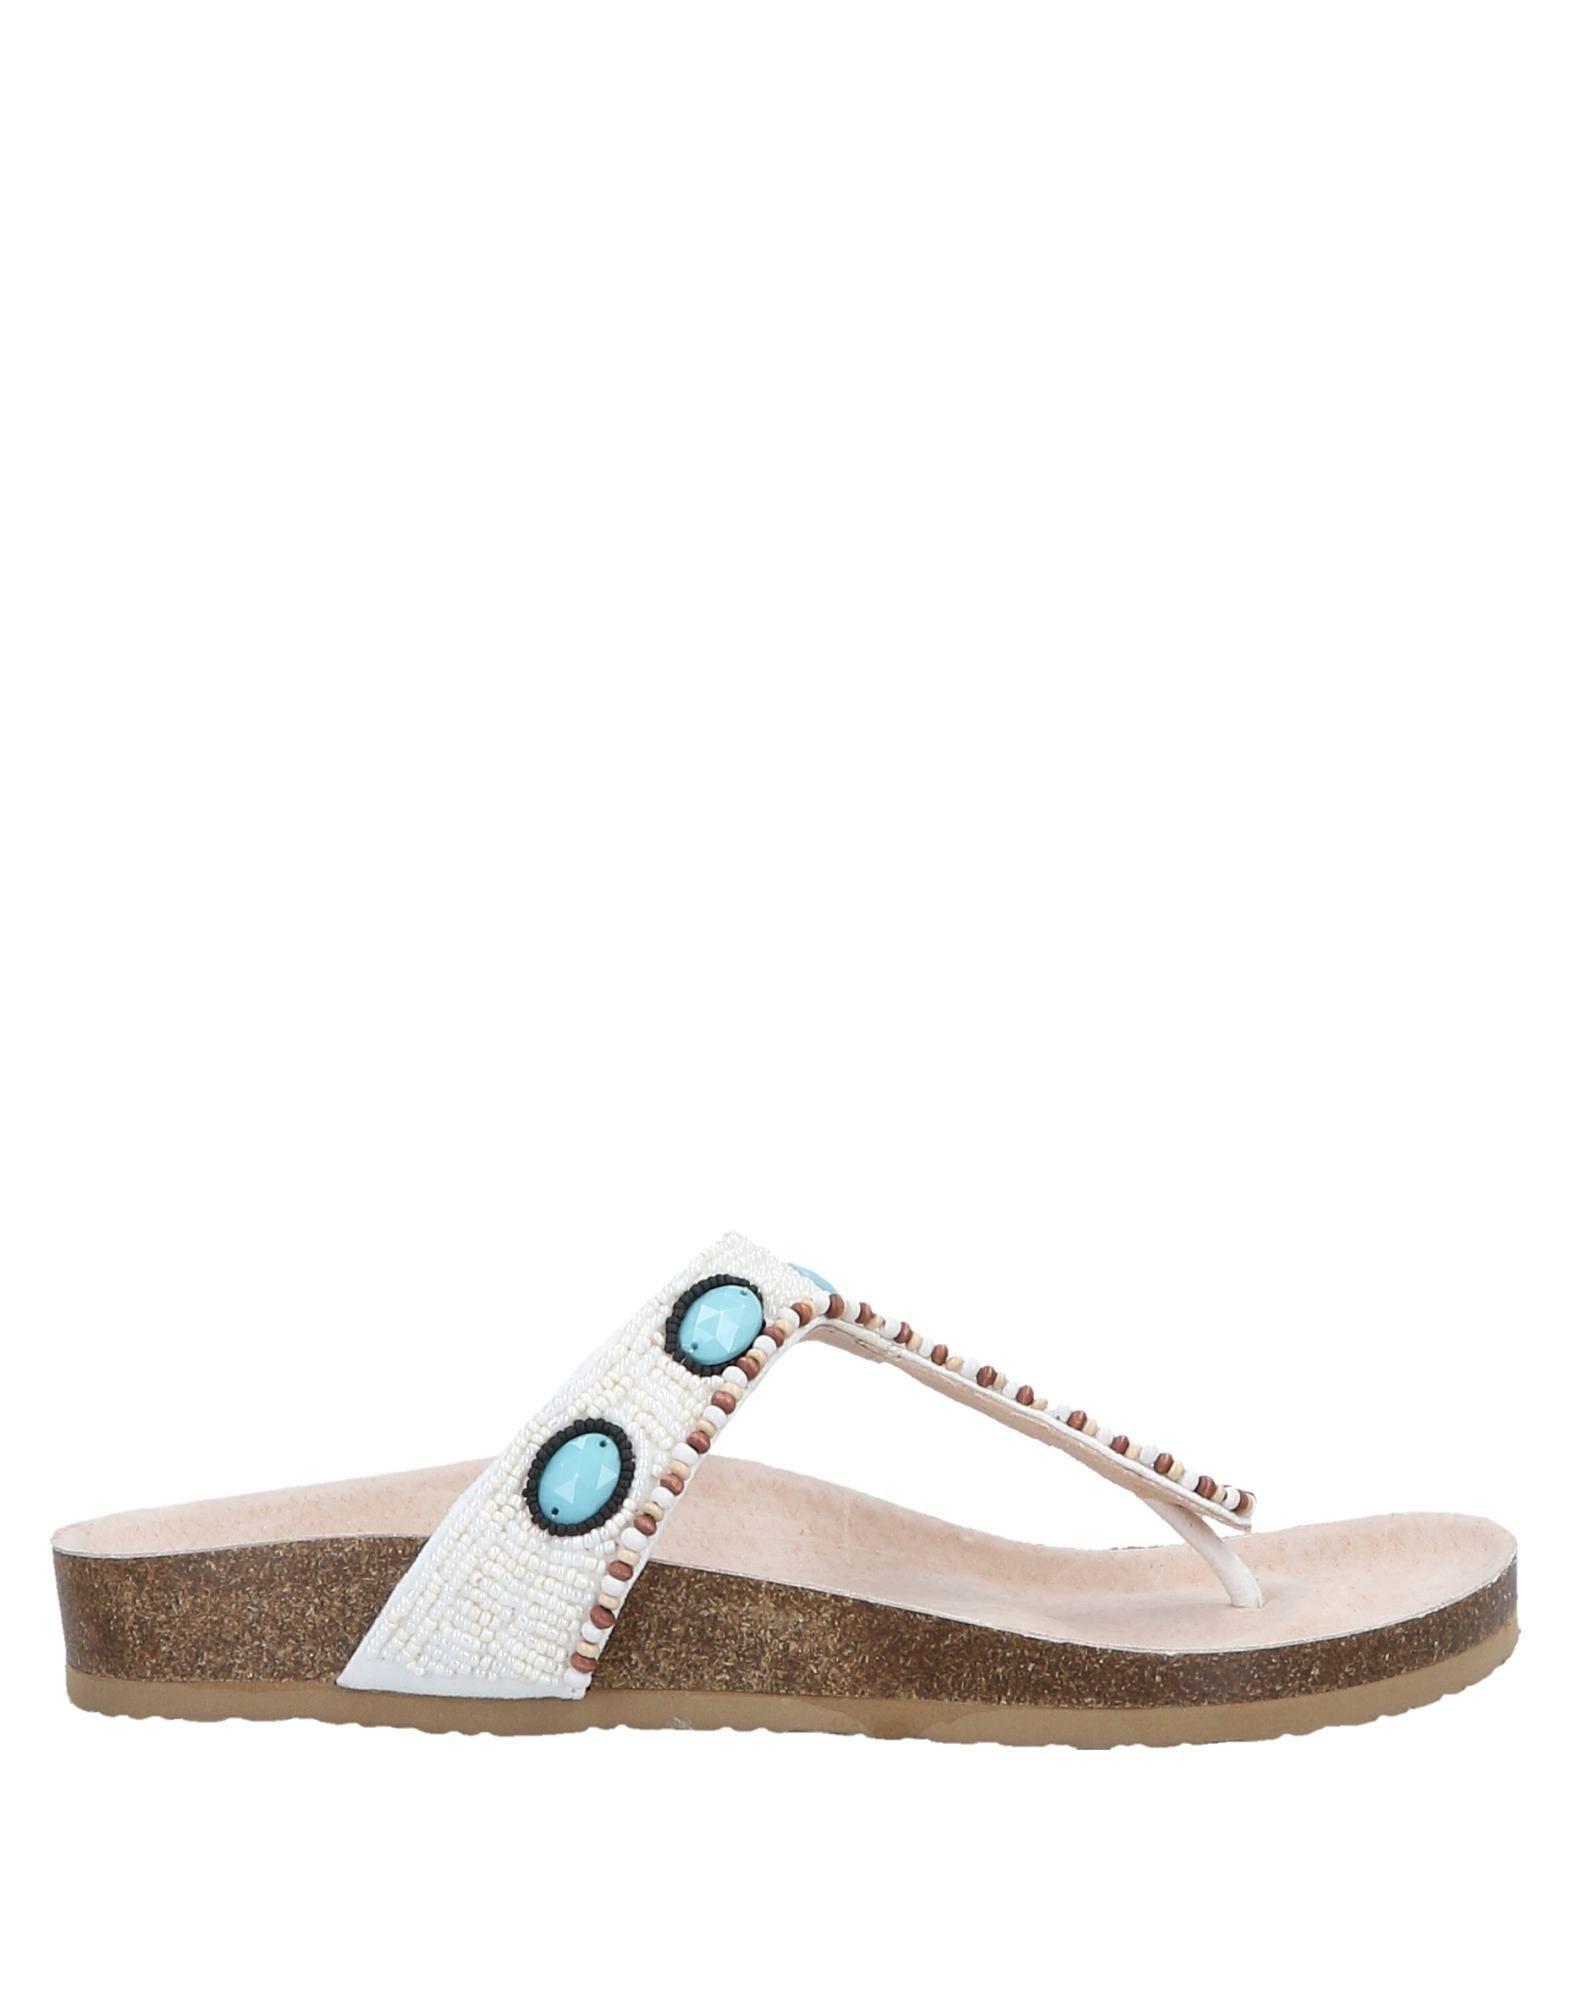 1c1eafa8c55f69 Lumberjack Toe Post Sandal in White - Save 26% - Lyst